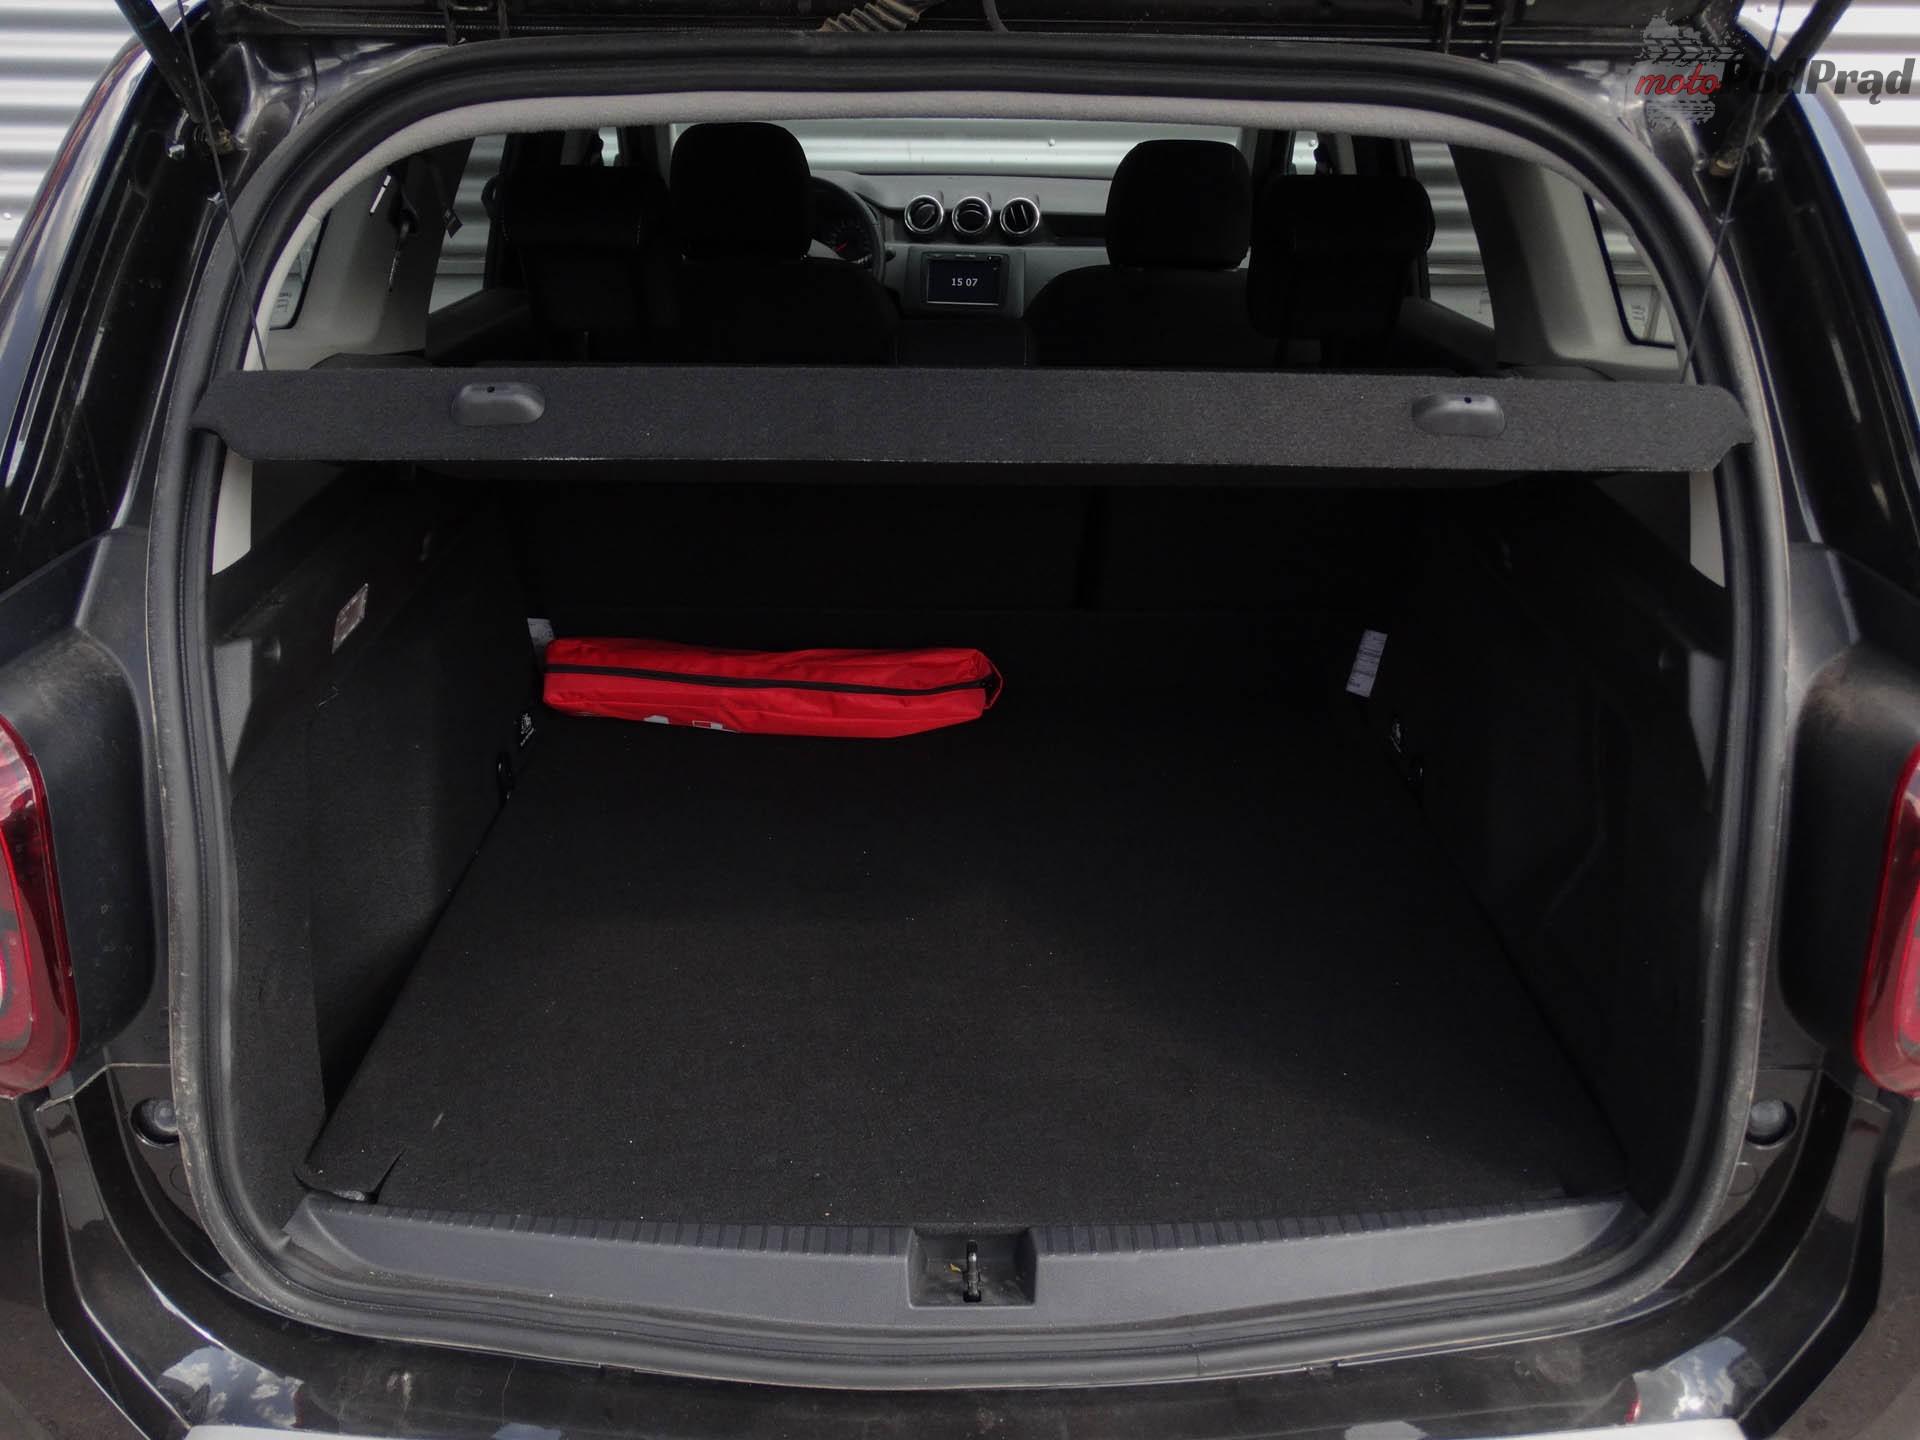 Dacia Duster 11 Test: Dacia Duster PRESTIGE 1.5 dci 4WD – w prostocie siła!